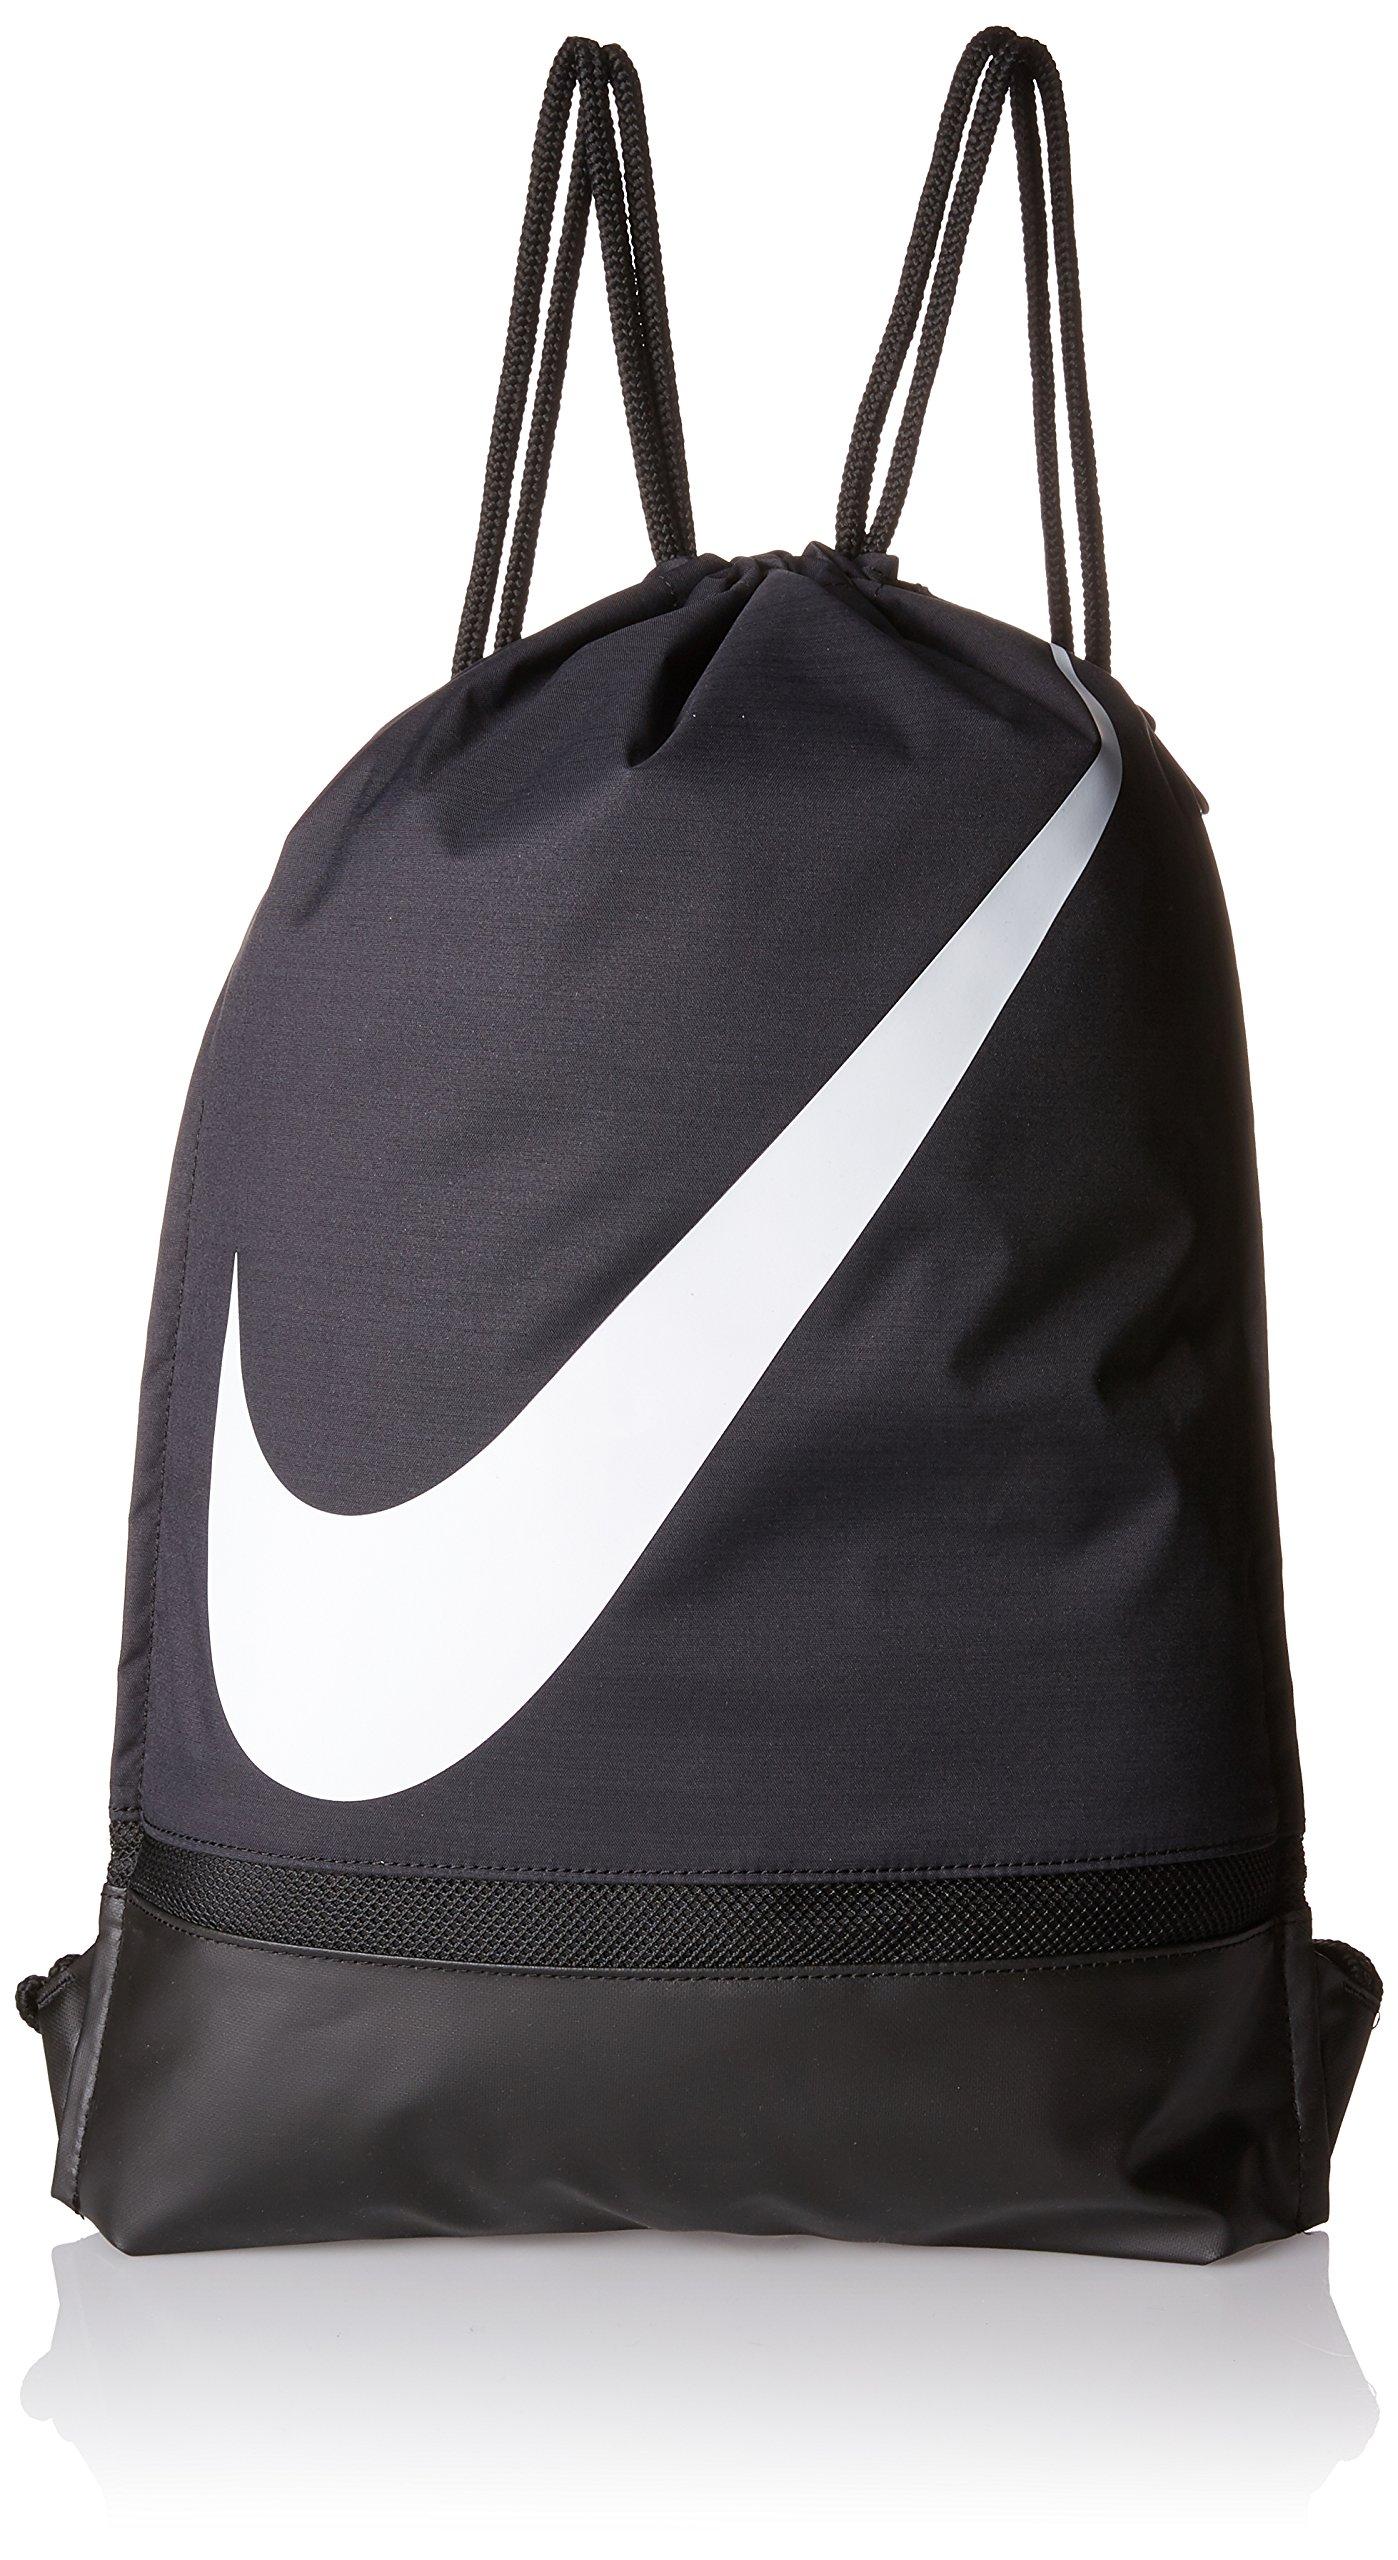 818pLV SyZL - Nike Gymsack Entrenamiento Bolsa